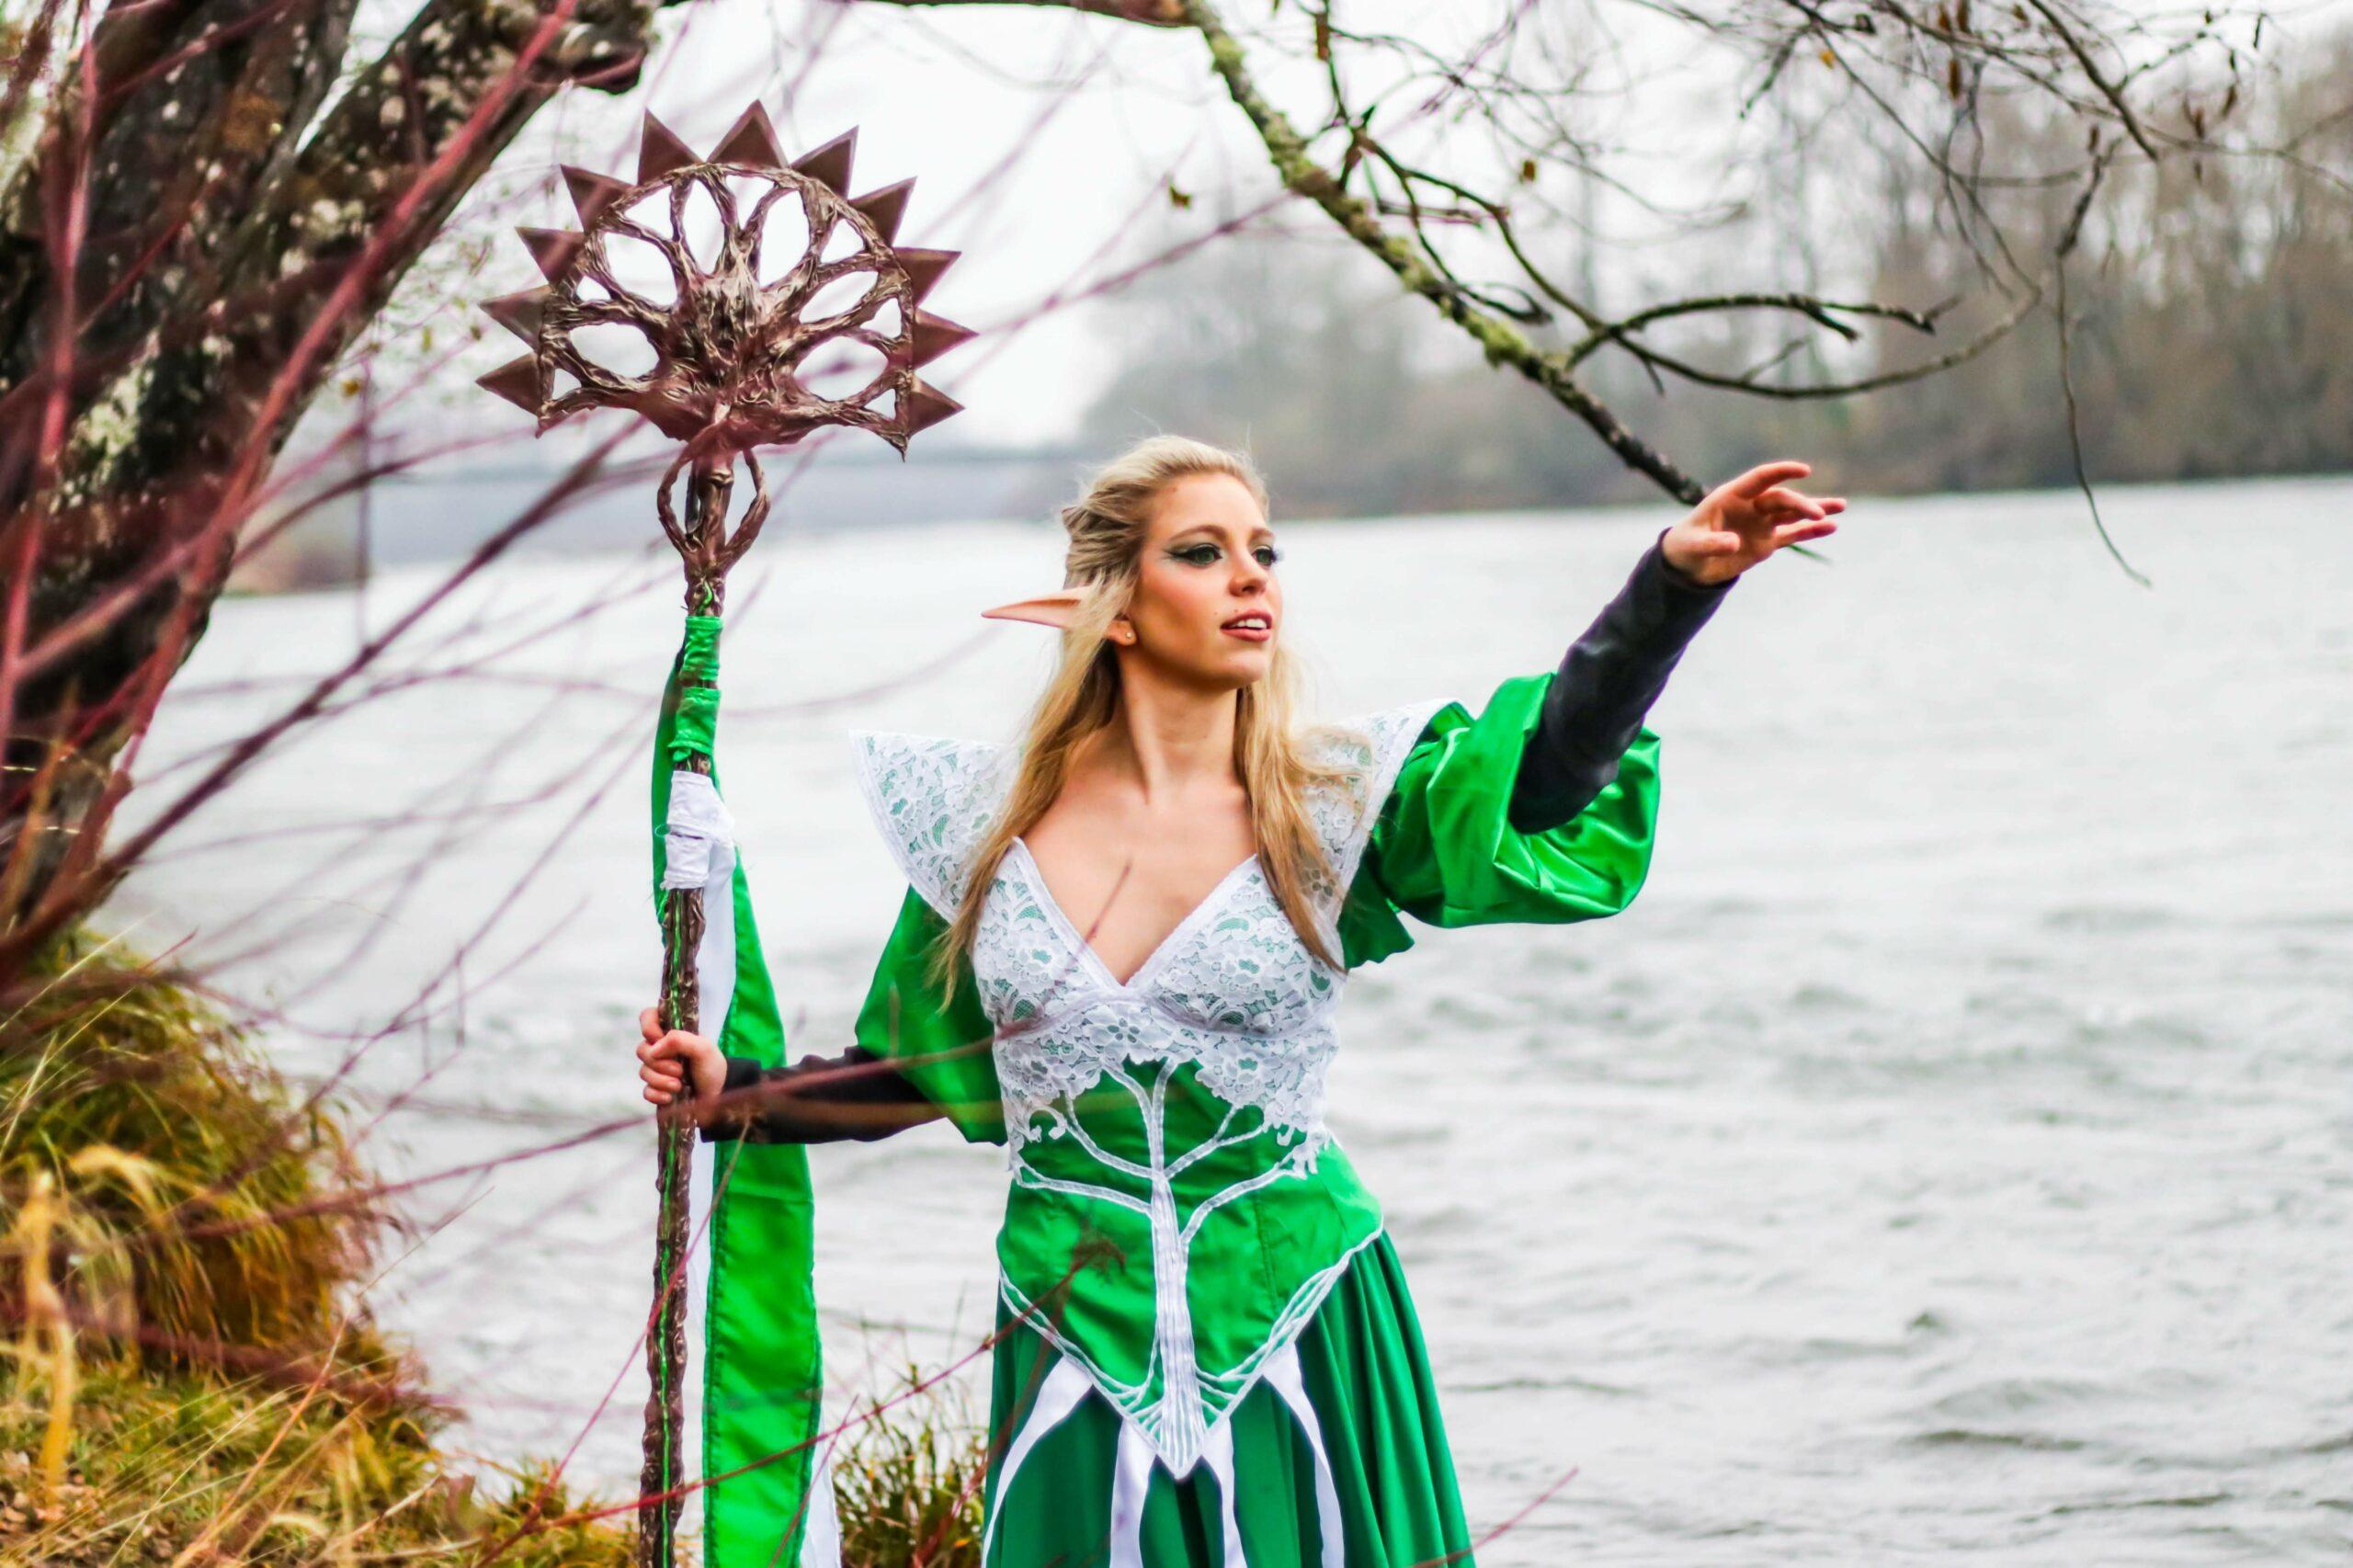 Zenaide as Emmara